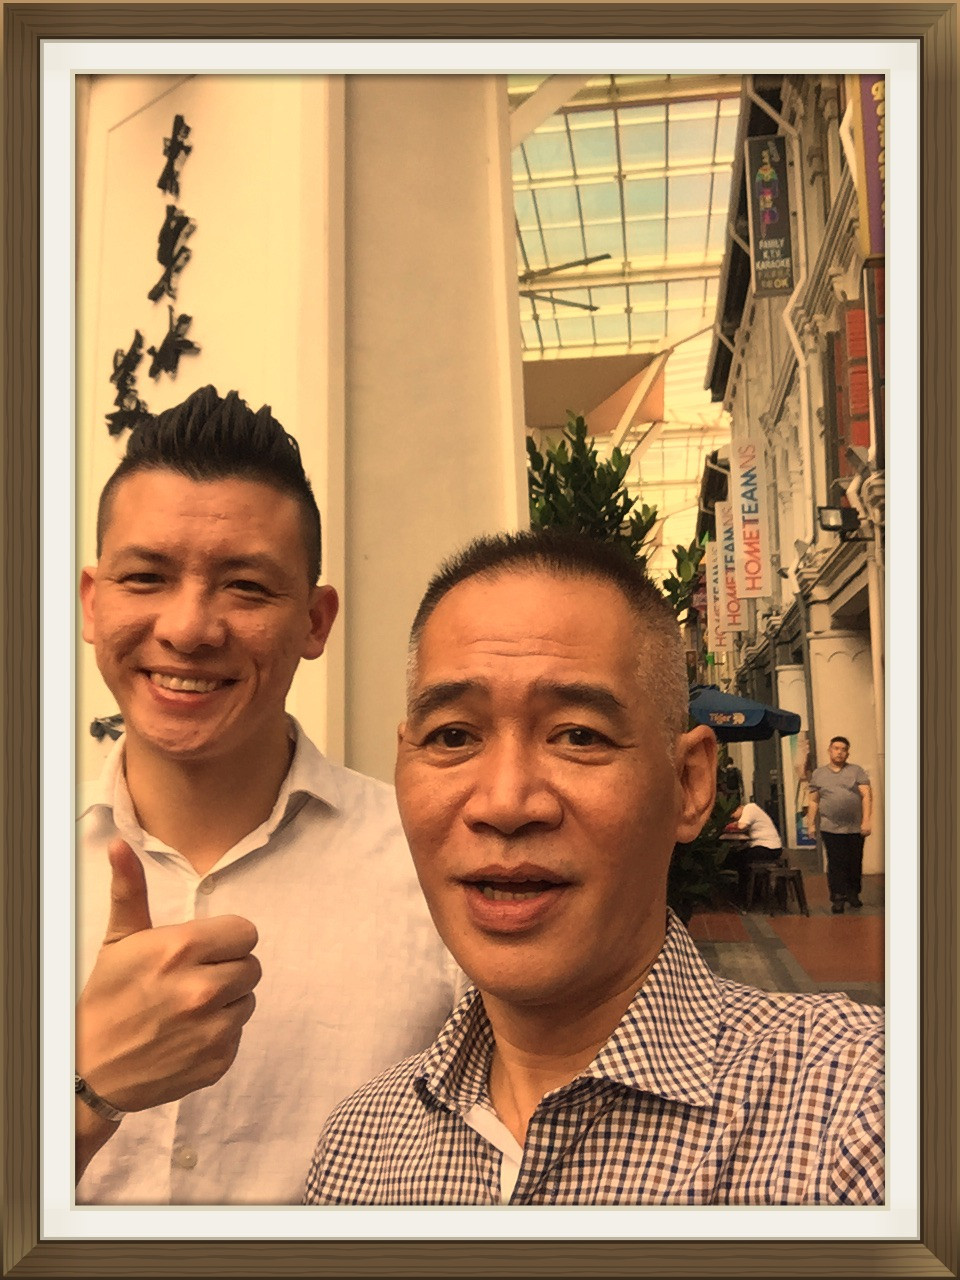 Selfie in China town street